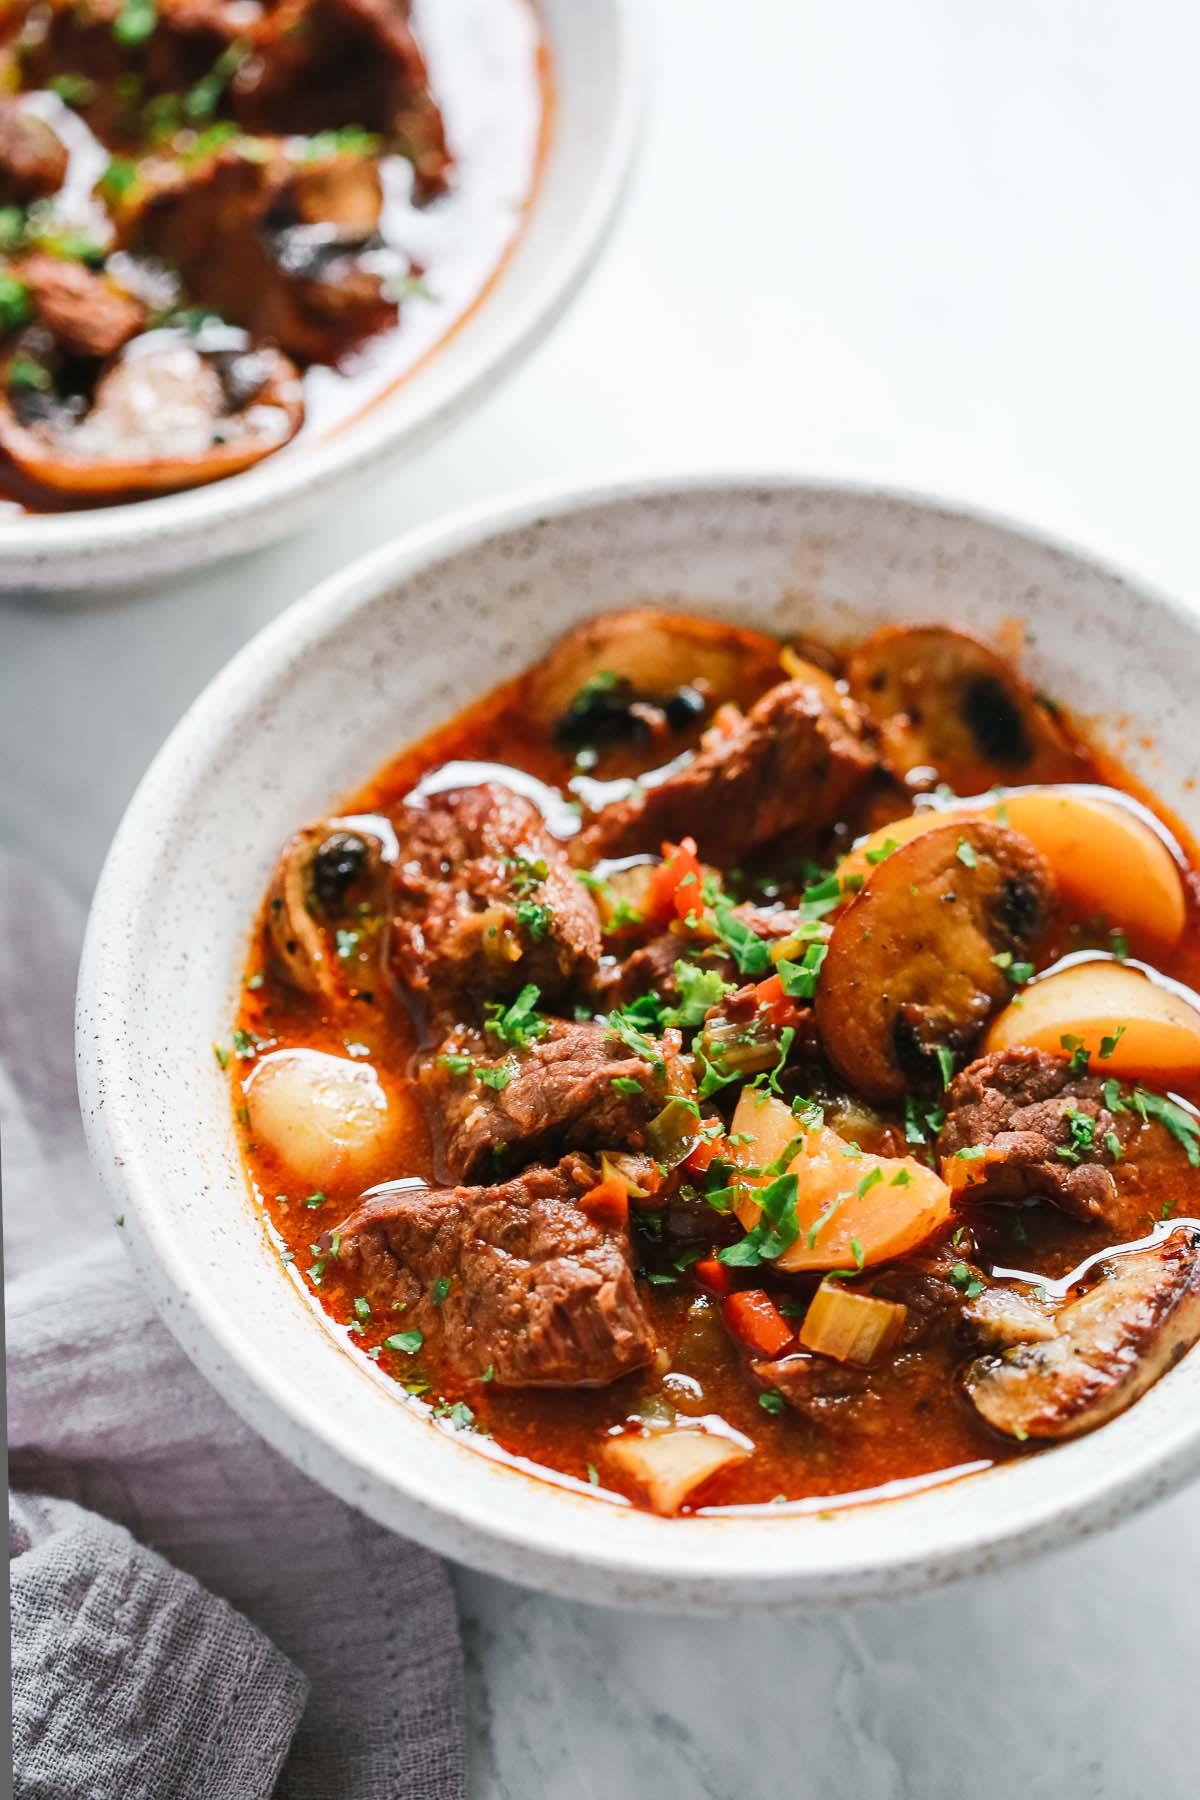 Instant Pot Beef Stew Recipe (Whole30 & Paleo)